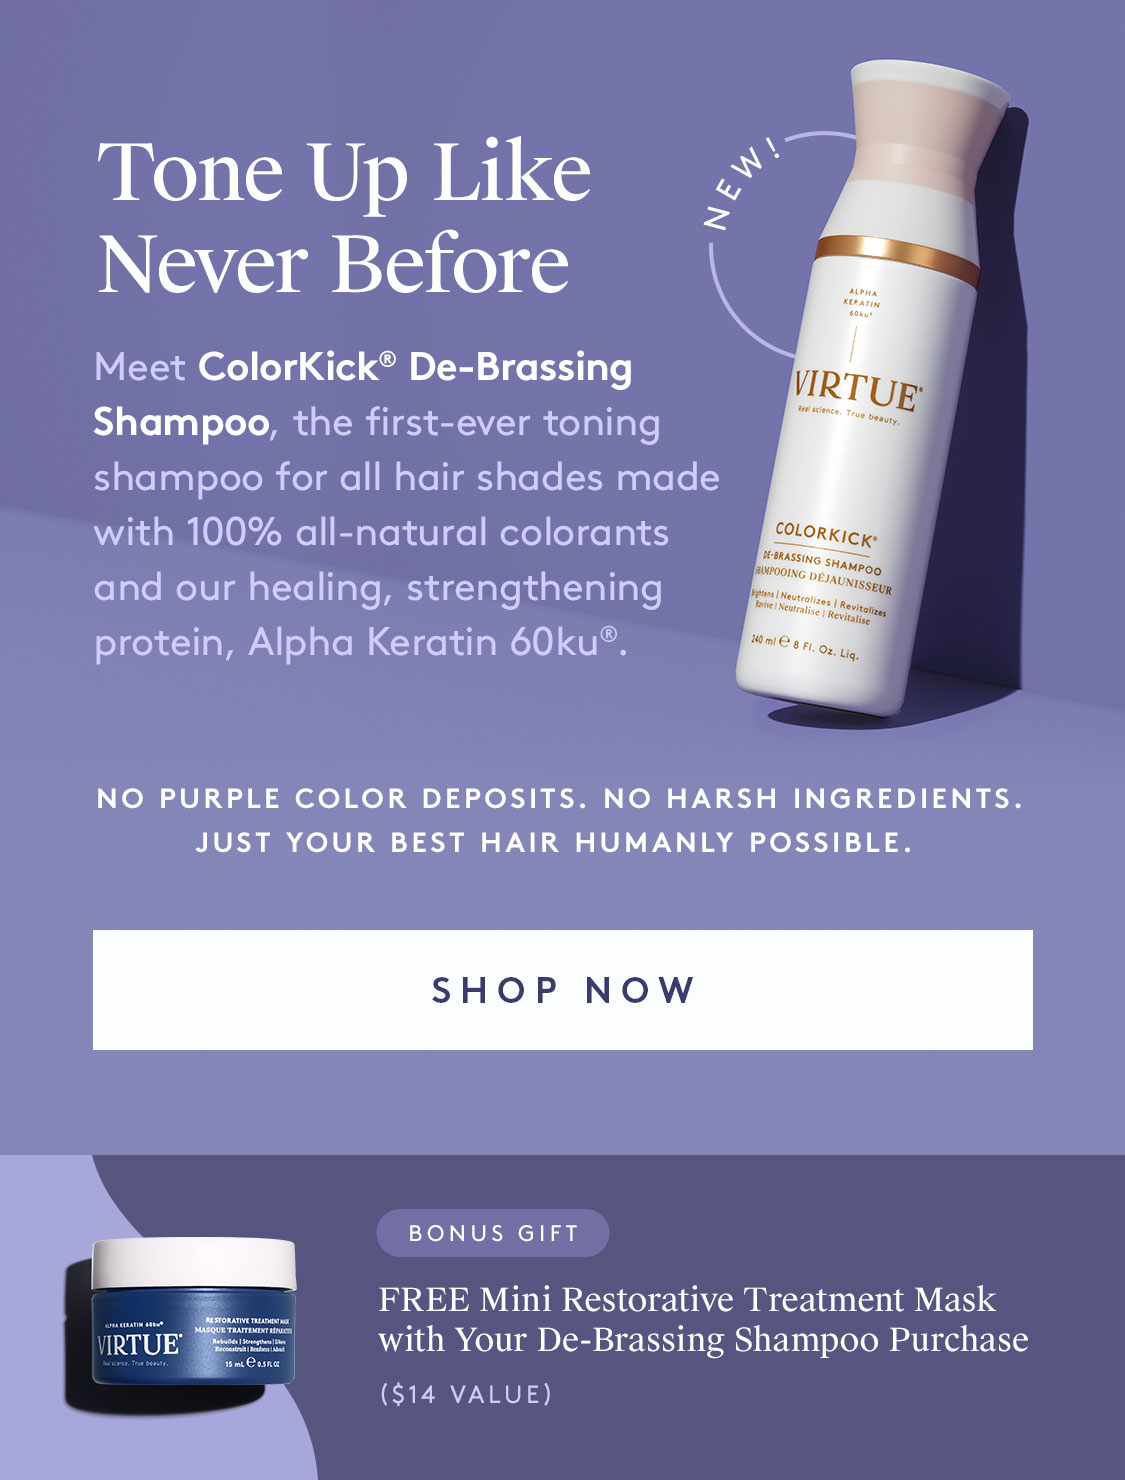 ColorKick De-Brassing Shampoo